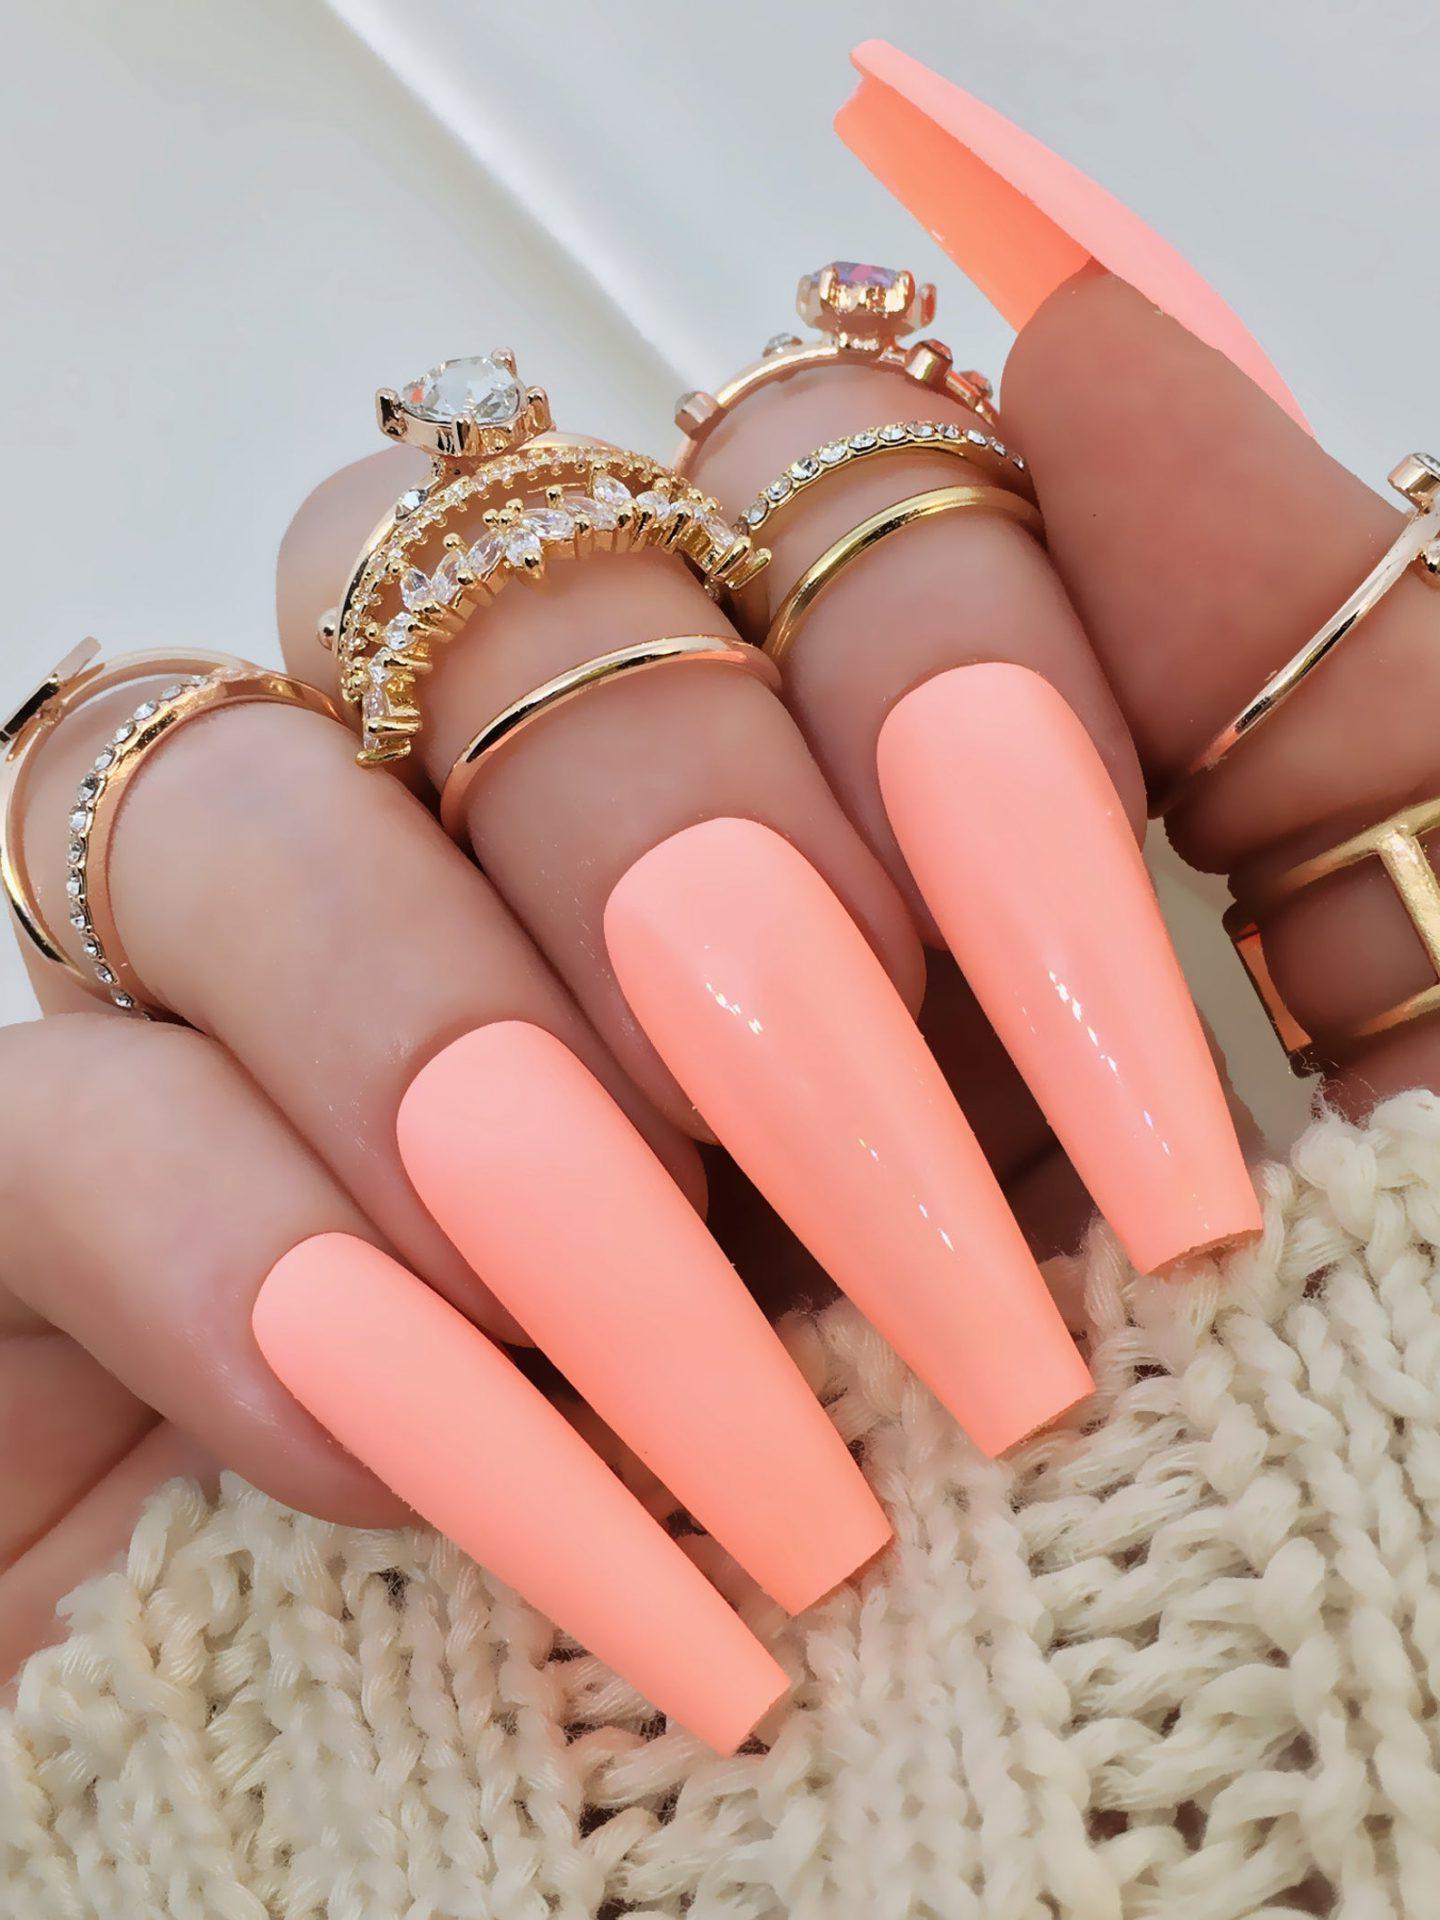 sommernägel 2021 trends ideen gelnägel 2021 sommer nageldesign sommer nägel farben ideen gelnägel coffin peach nude farbe goldene ringe